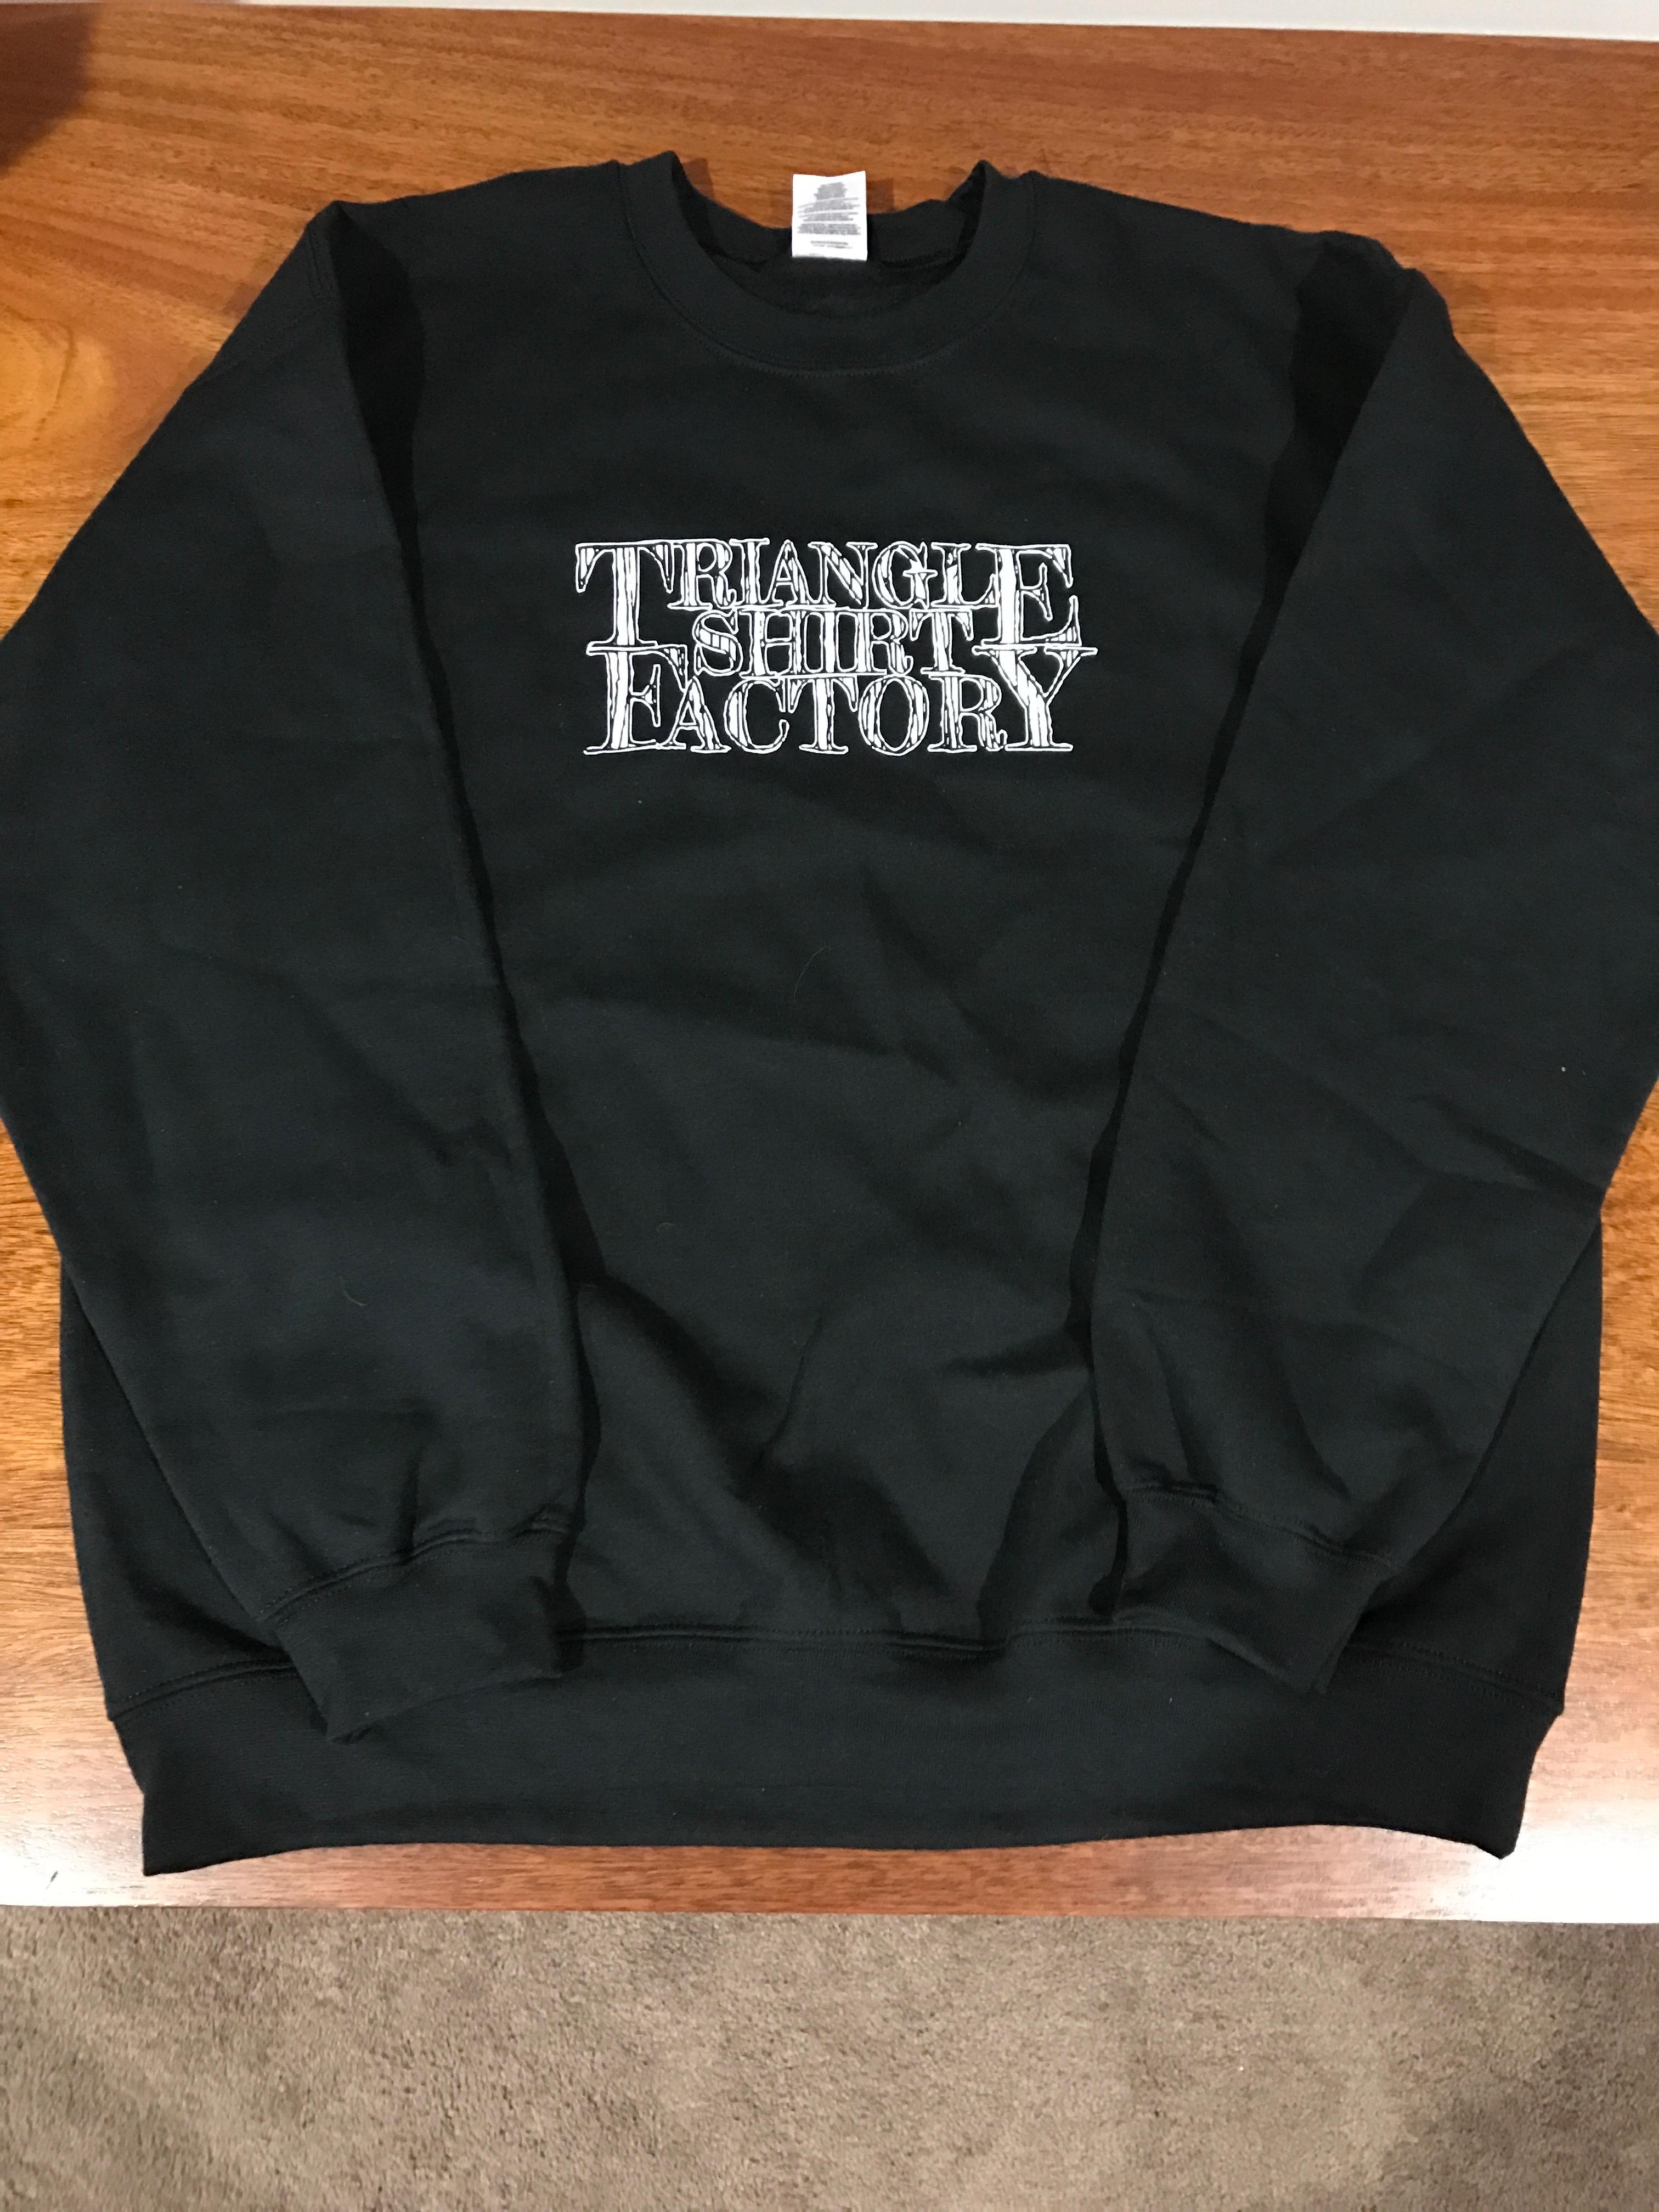 Triangle Shirt Factory Crewneck Sweatshirt